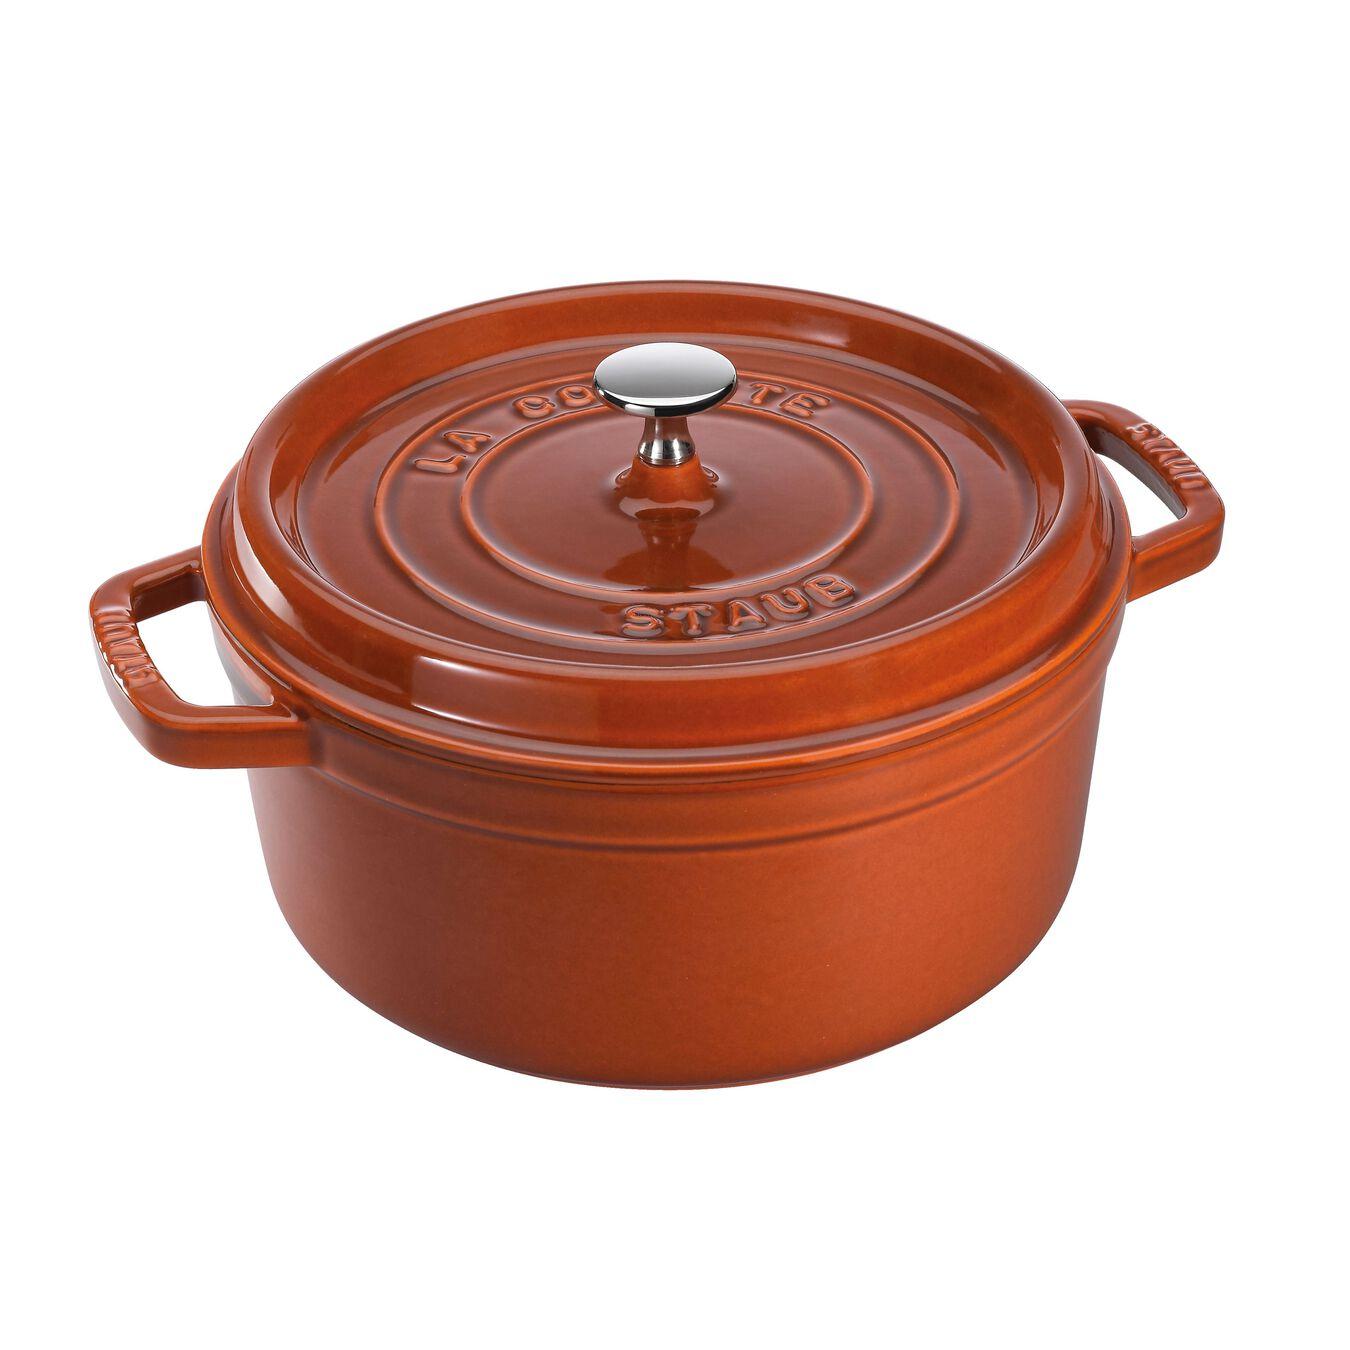 4-qt Round Cocotte - Burnt Orange,,large 1